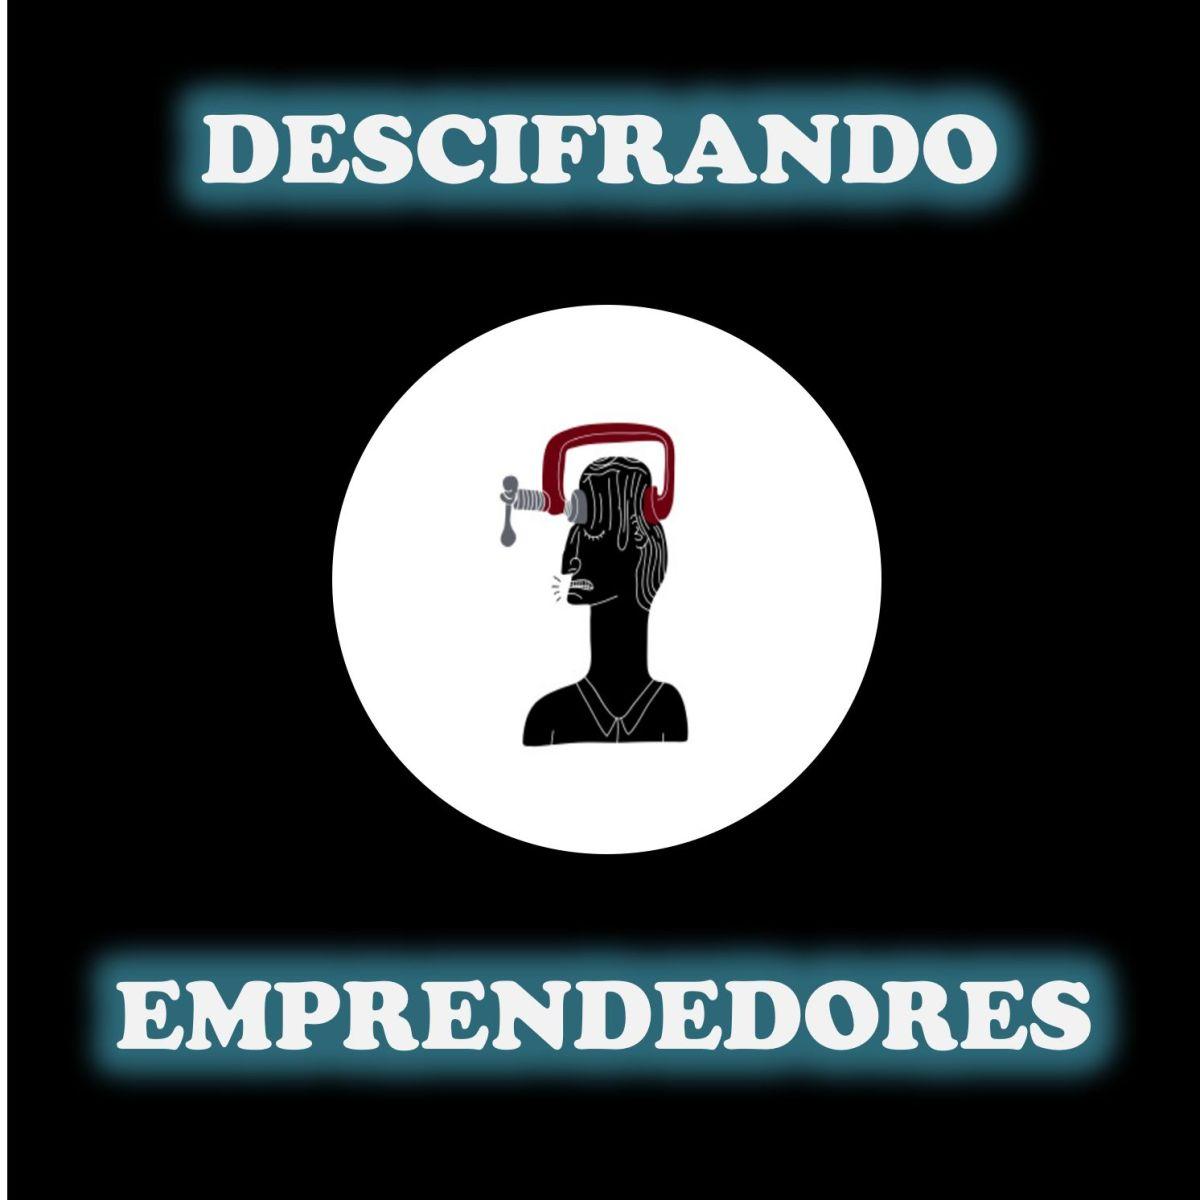 Descifrando emprendedores